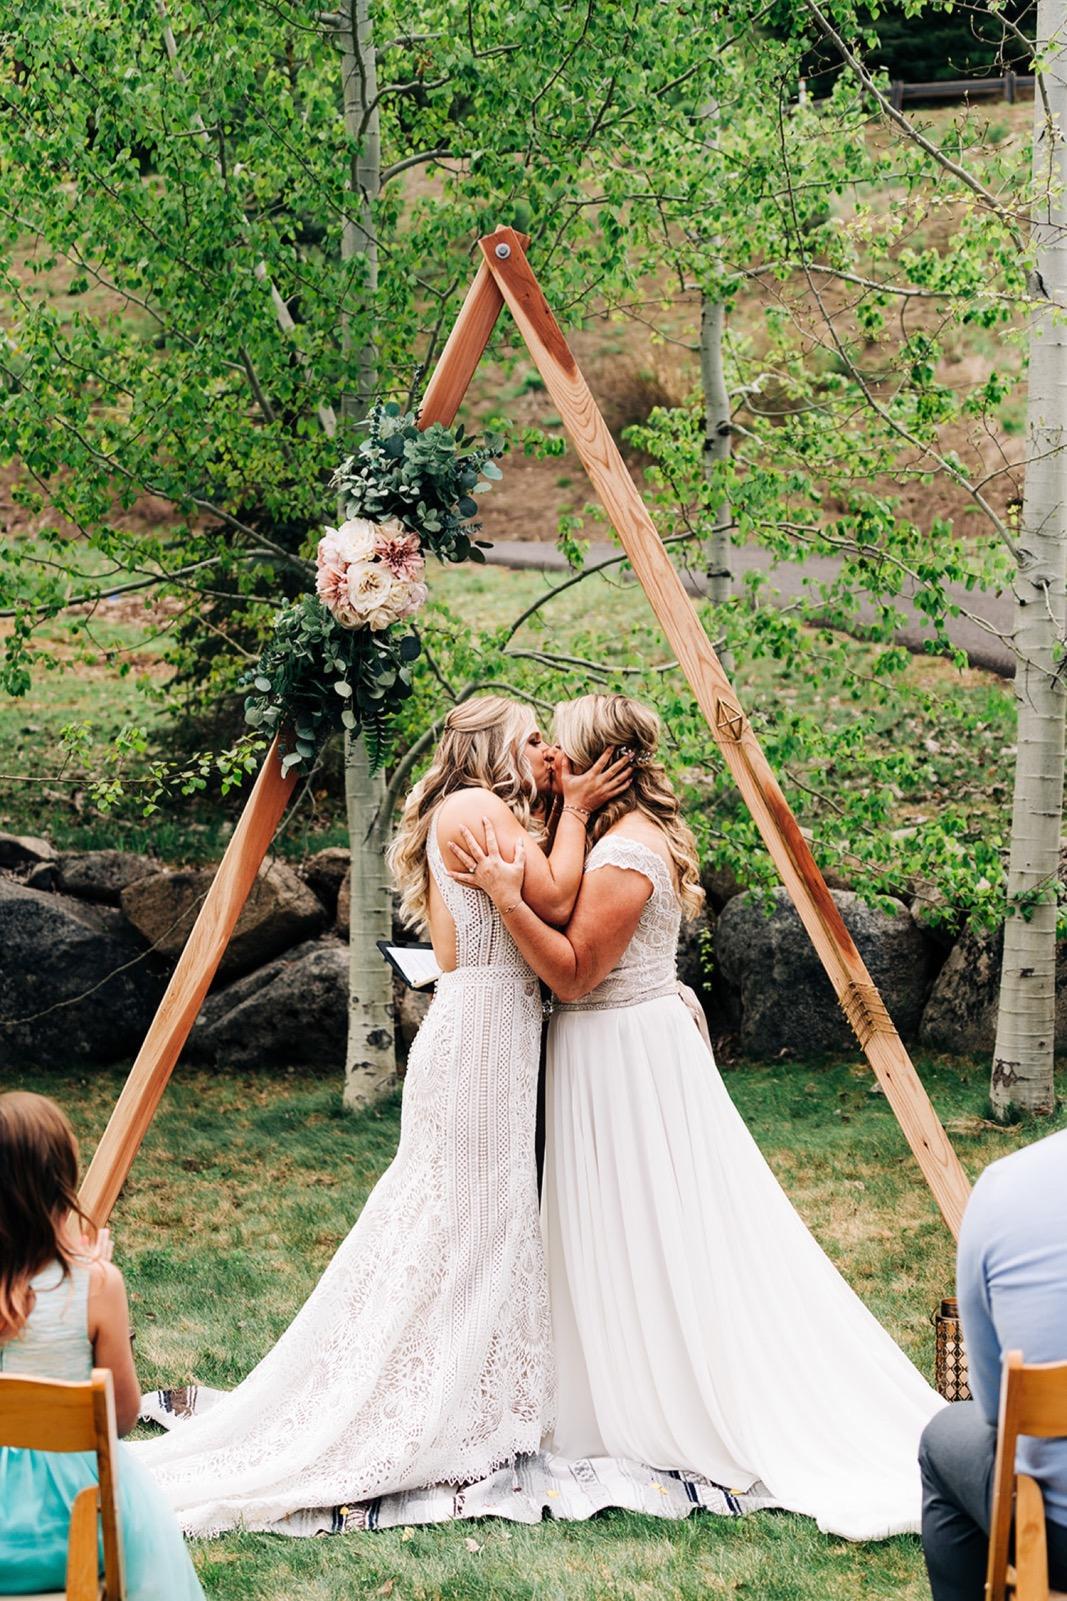 089_falissa_heather_wedding-226.jpg